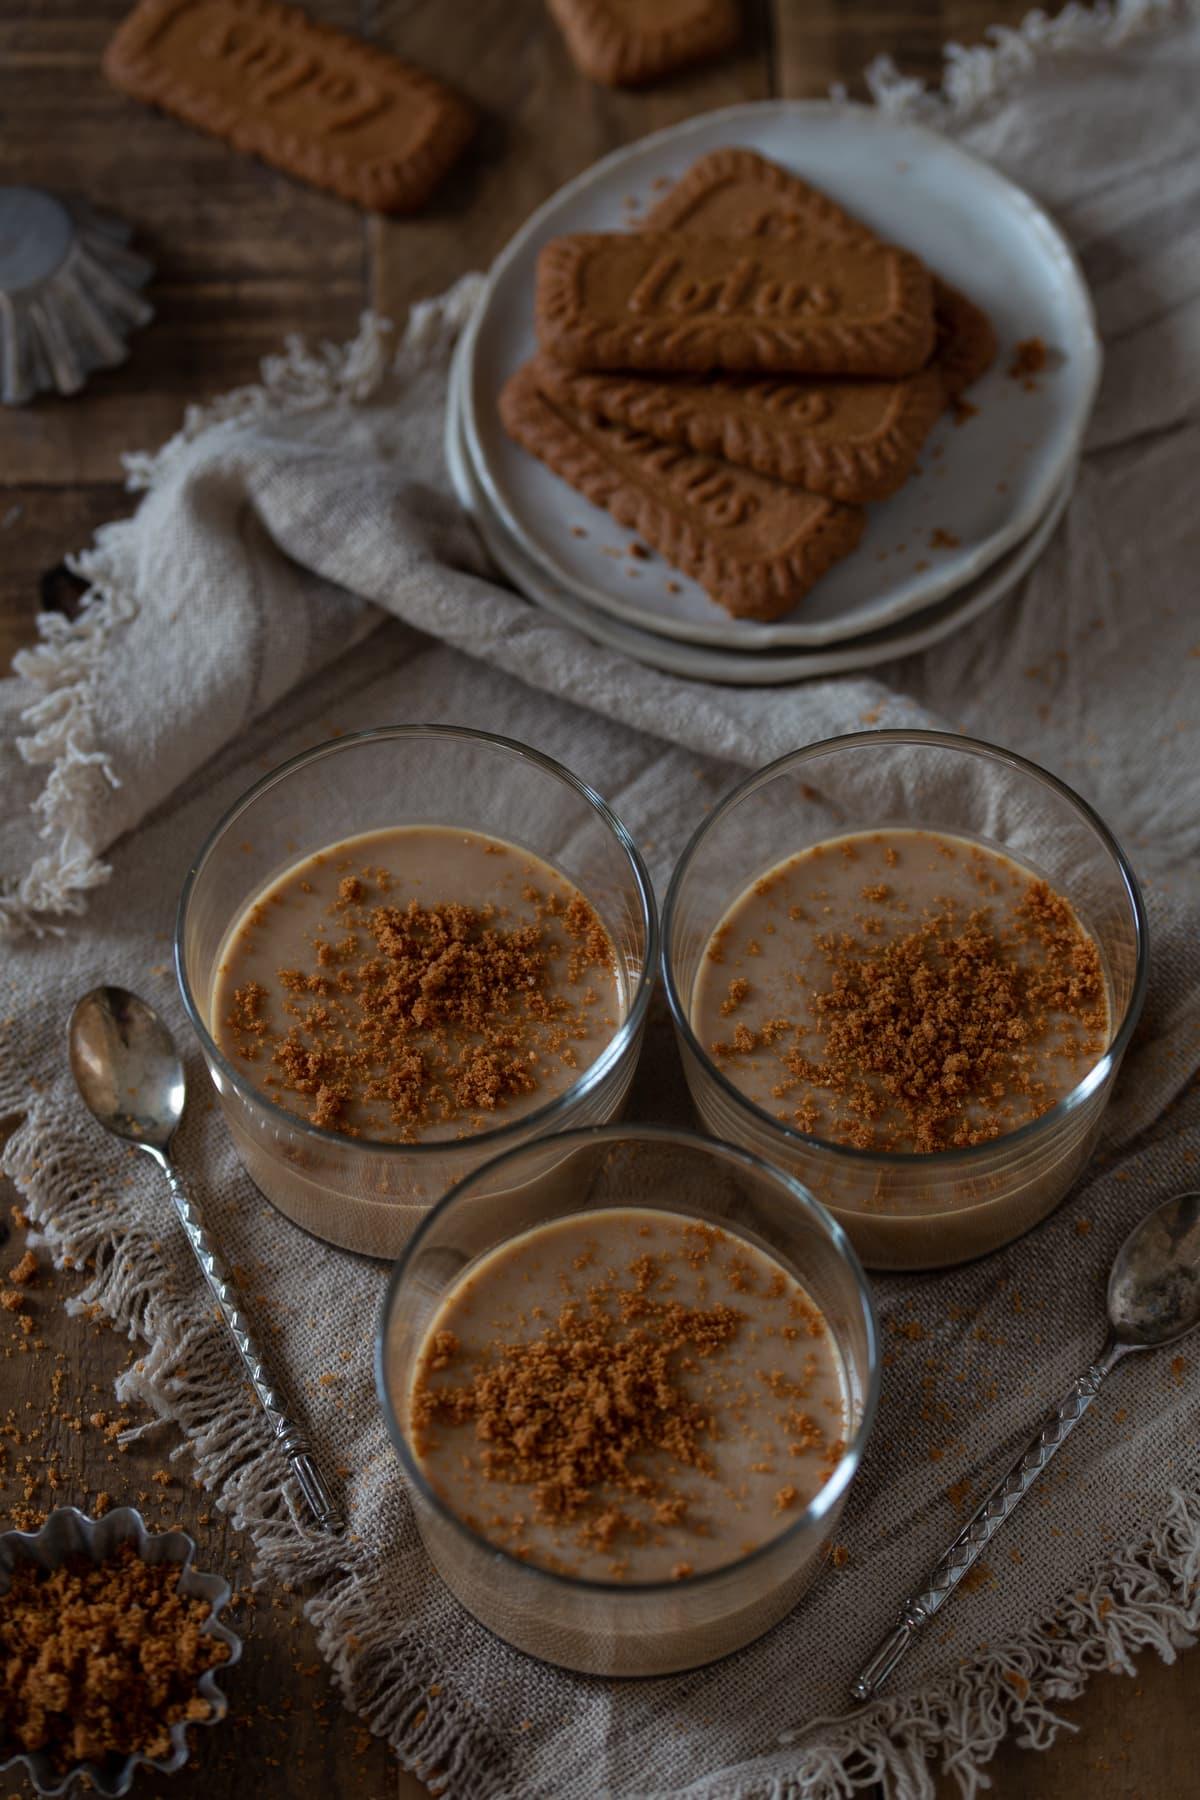 Lotus Biscoff panna cotta made with Lotus cookies.